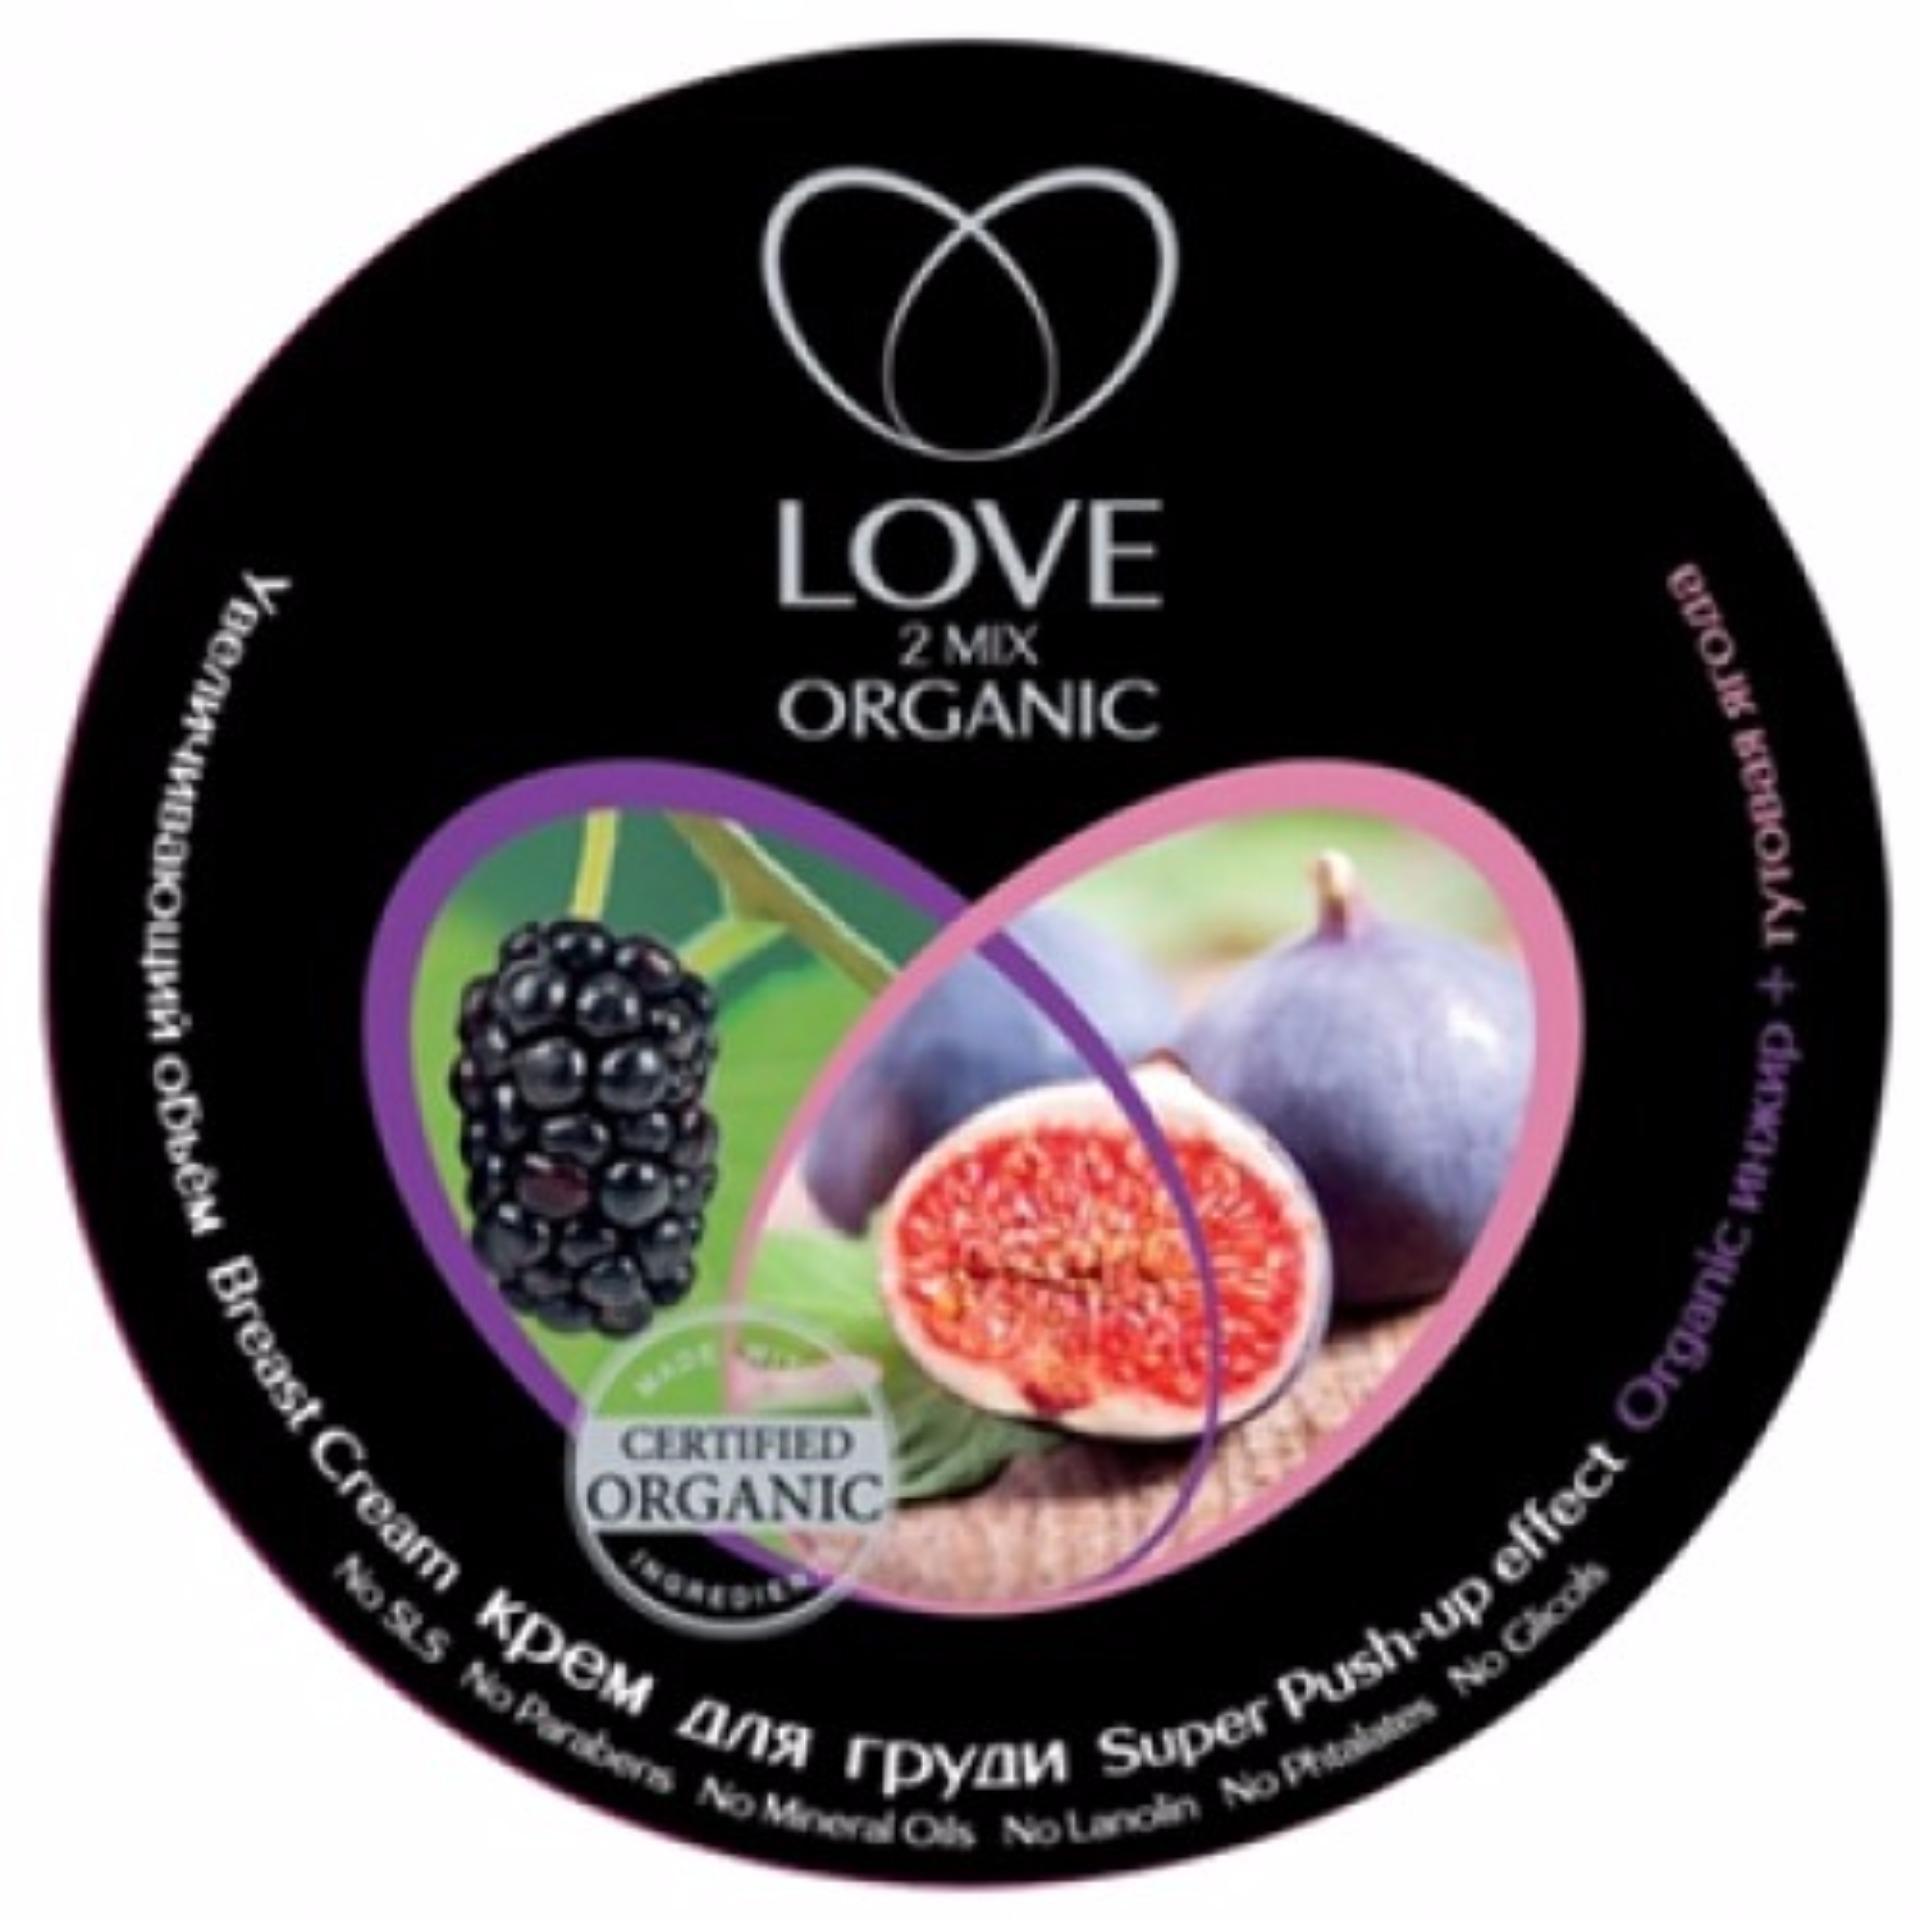 Kem massage nở ngực Love 2 Mix Organic 250ml